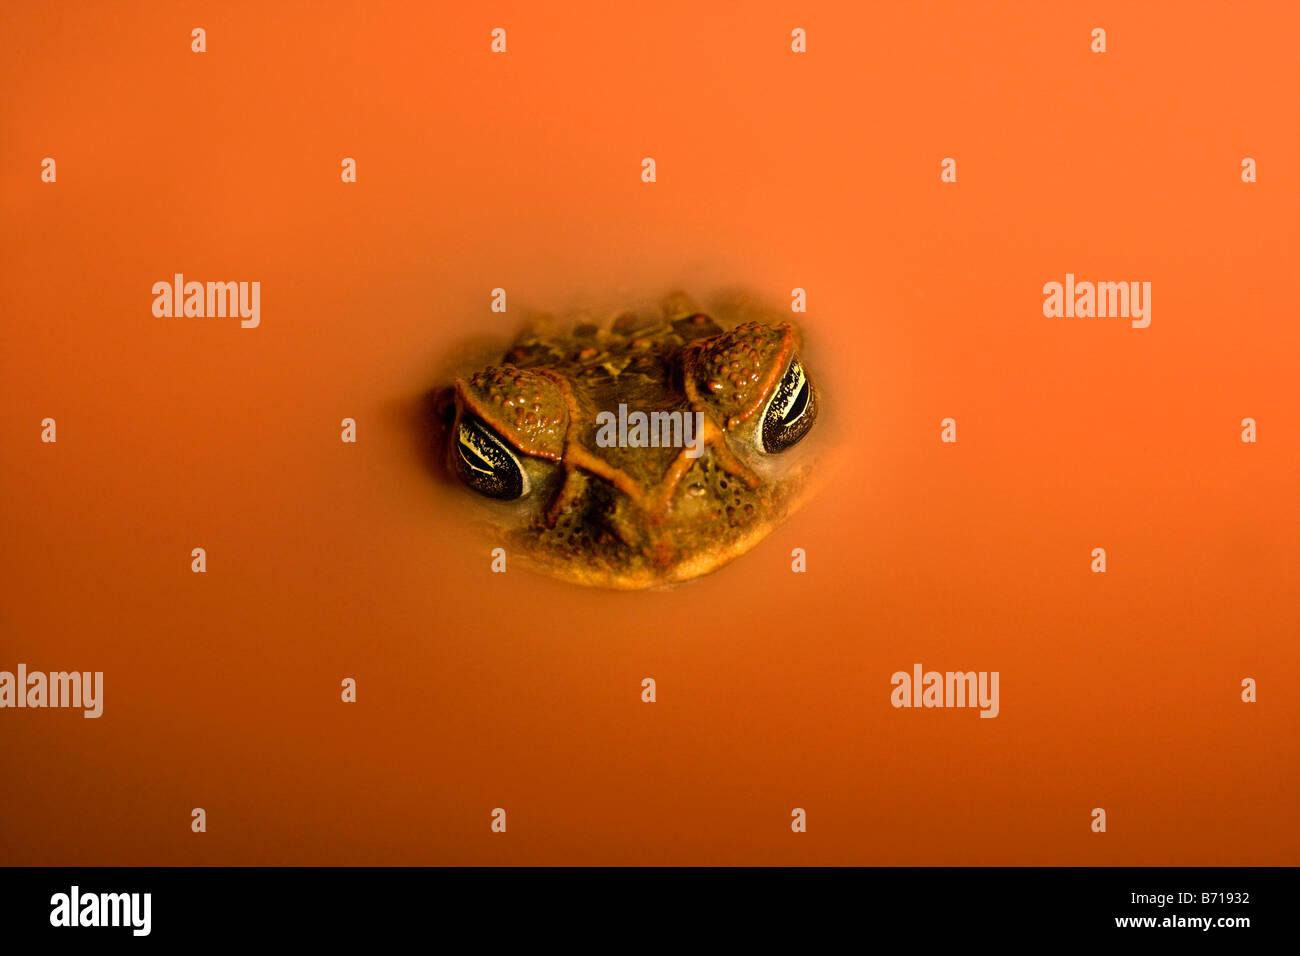 Suriname, Brownsweg, Brownsberg Parque Nacional. El Sapo de caña (Bufo marinus). En la piscina de laterita. Imagen De Stock